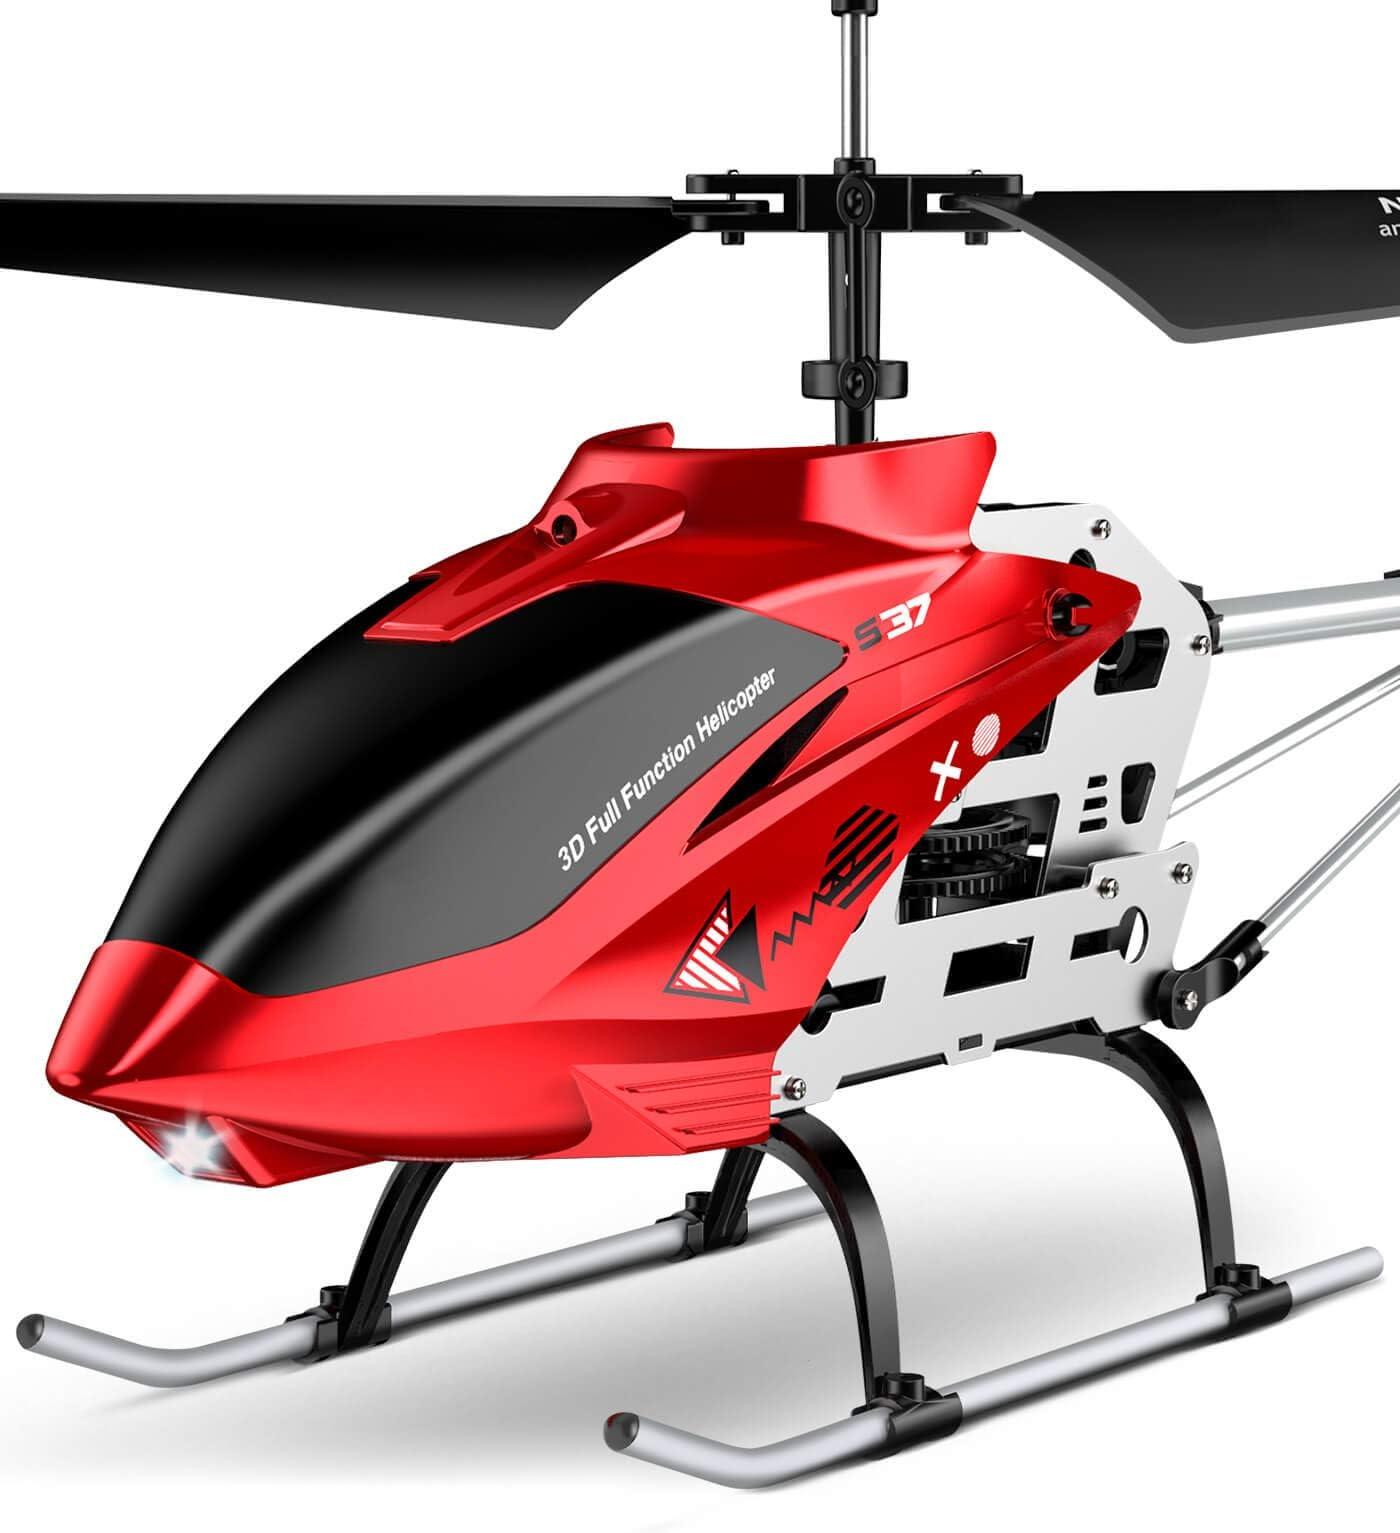 HORIZON HOBBY Blade 120 S blh4105 Rotor vague support bh8 ®